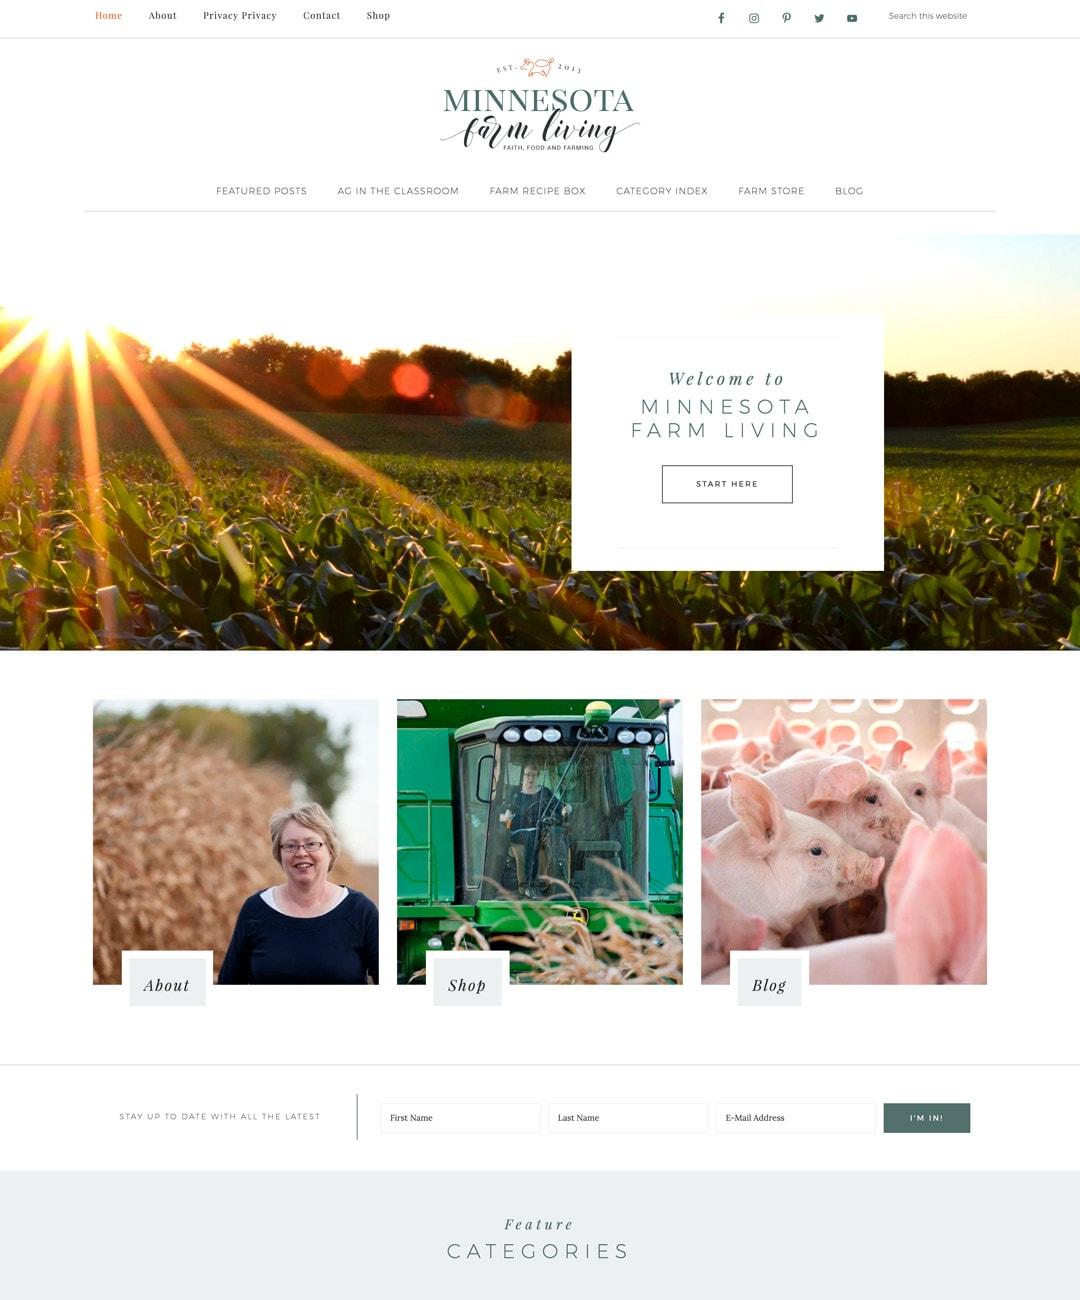 Minnesota Farm Living Blog Design 2019